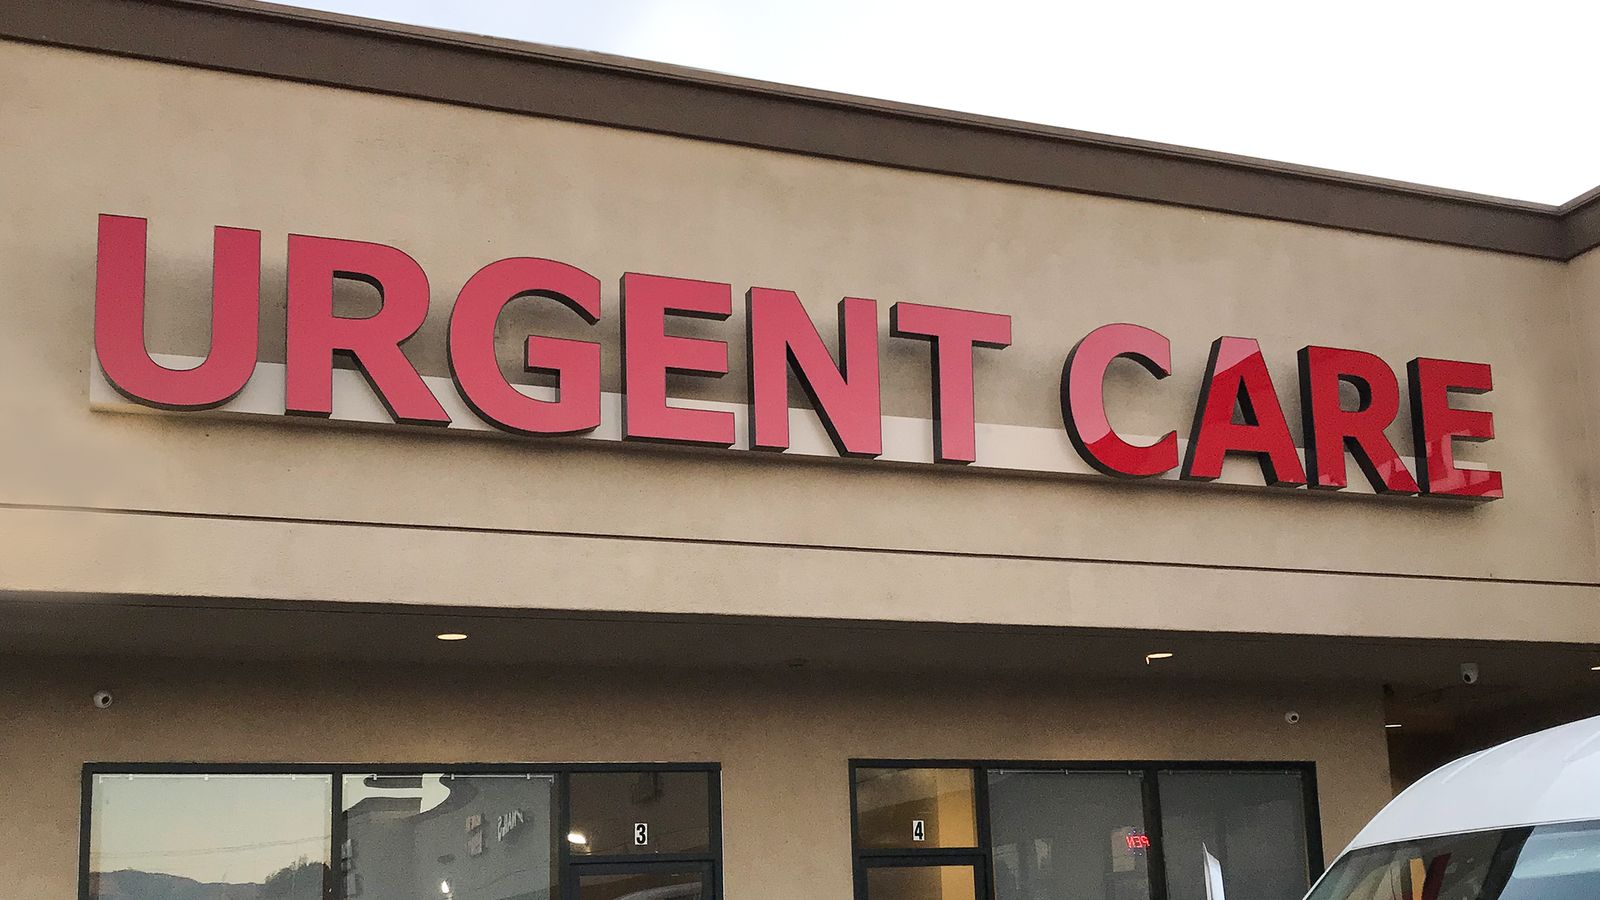 Urgent Care light-up sign